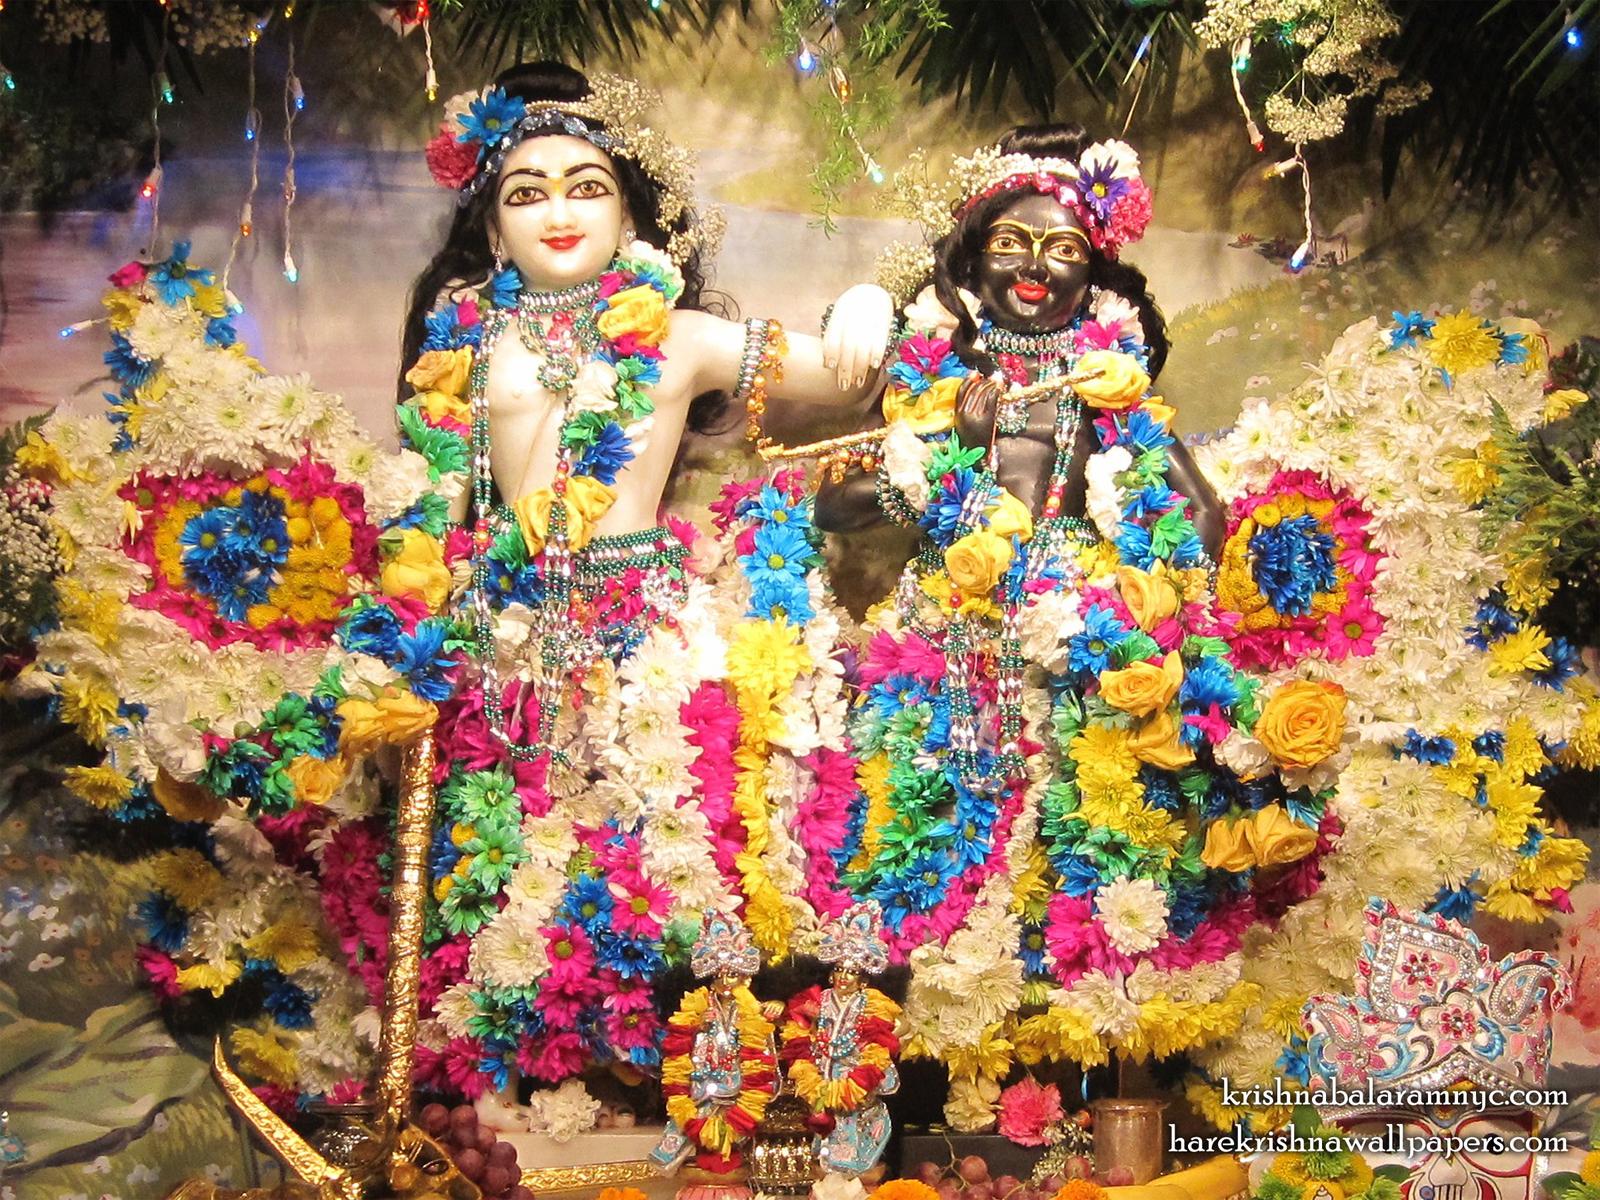 Sri Sri Hari Haladhari Wallpaper (002) Size1600x1200 Download